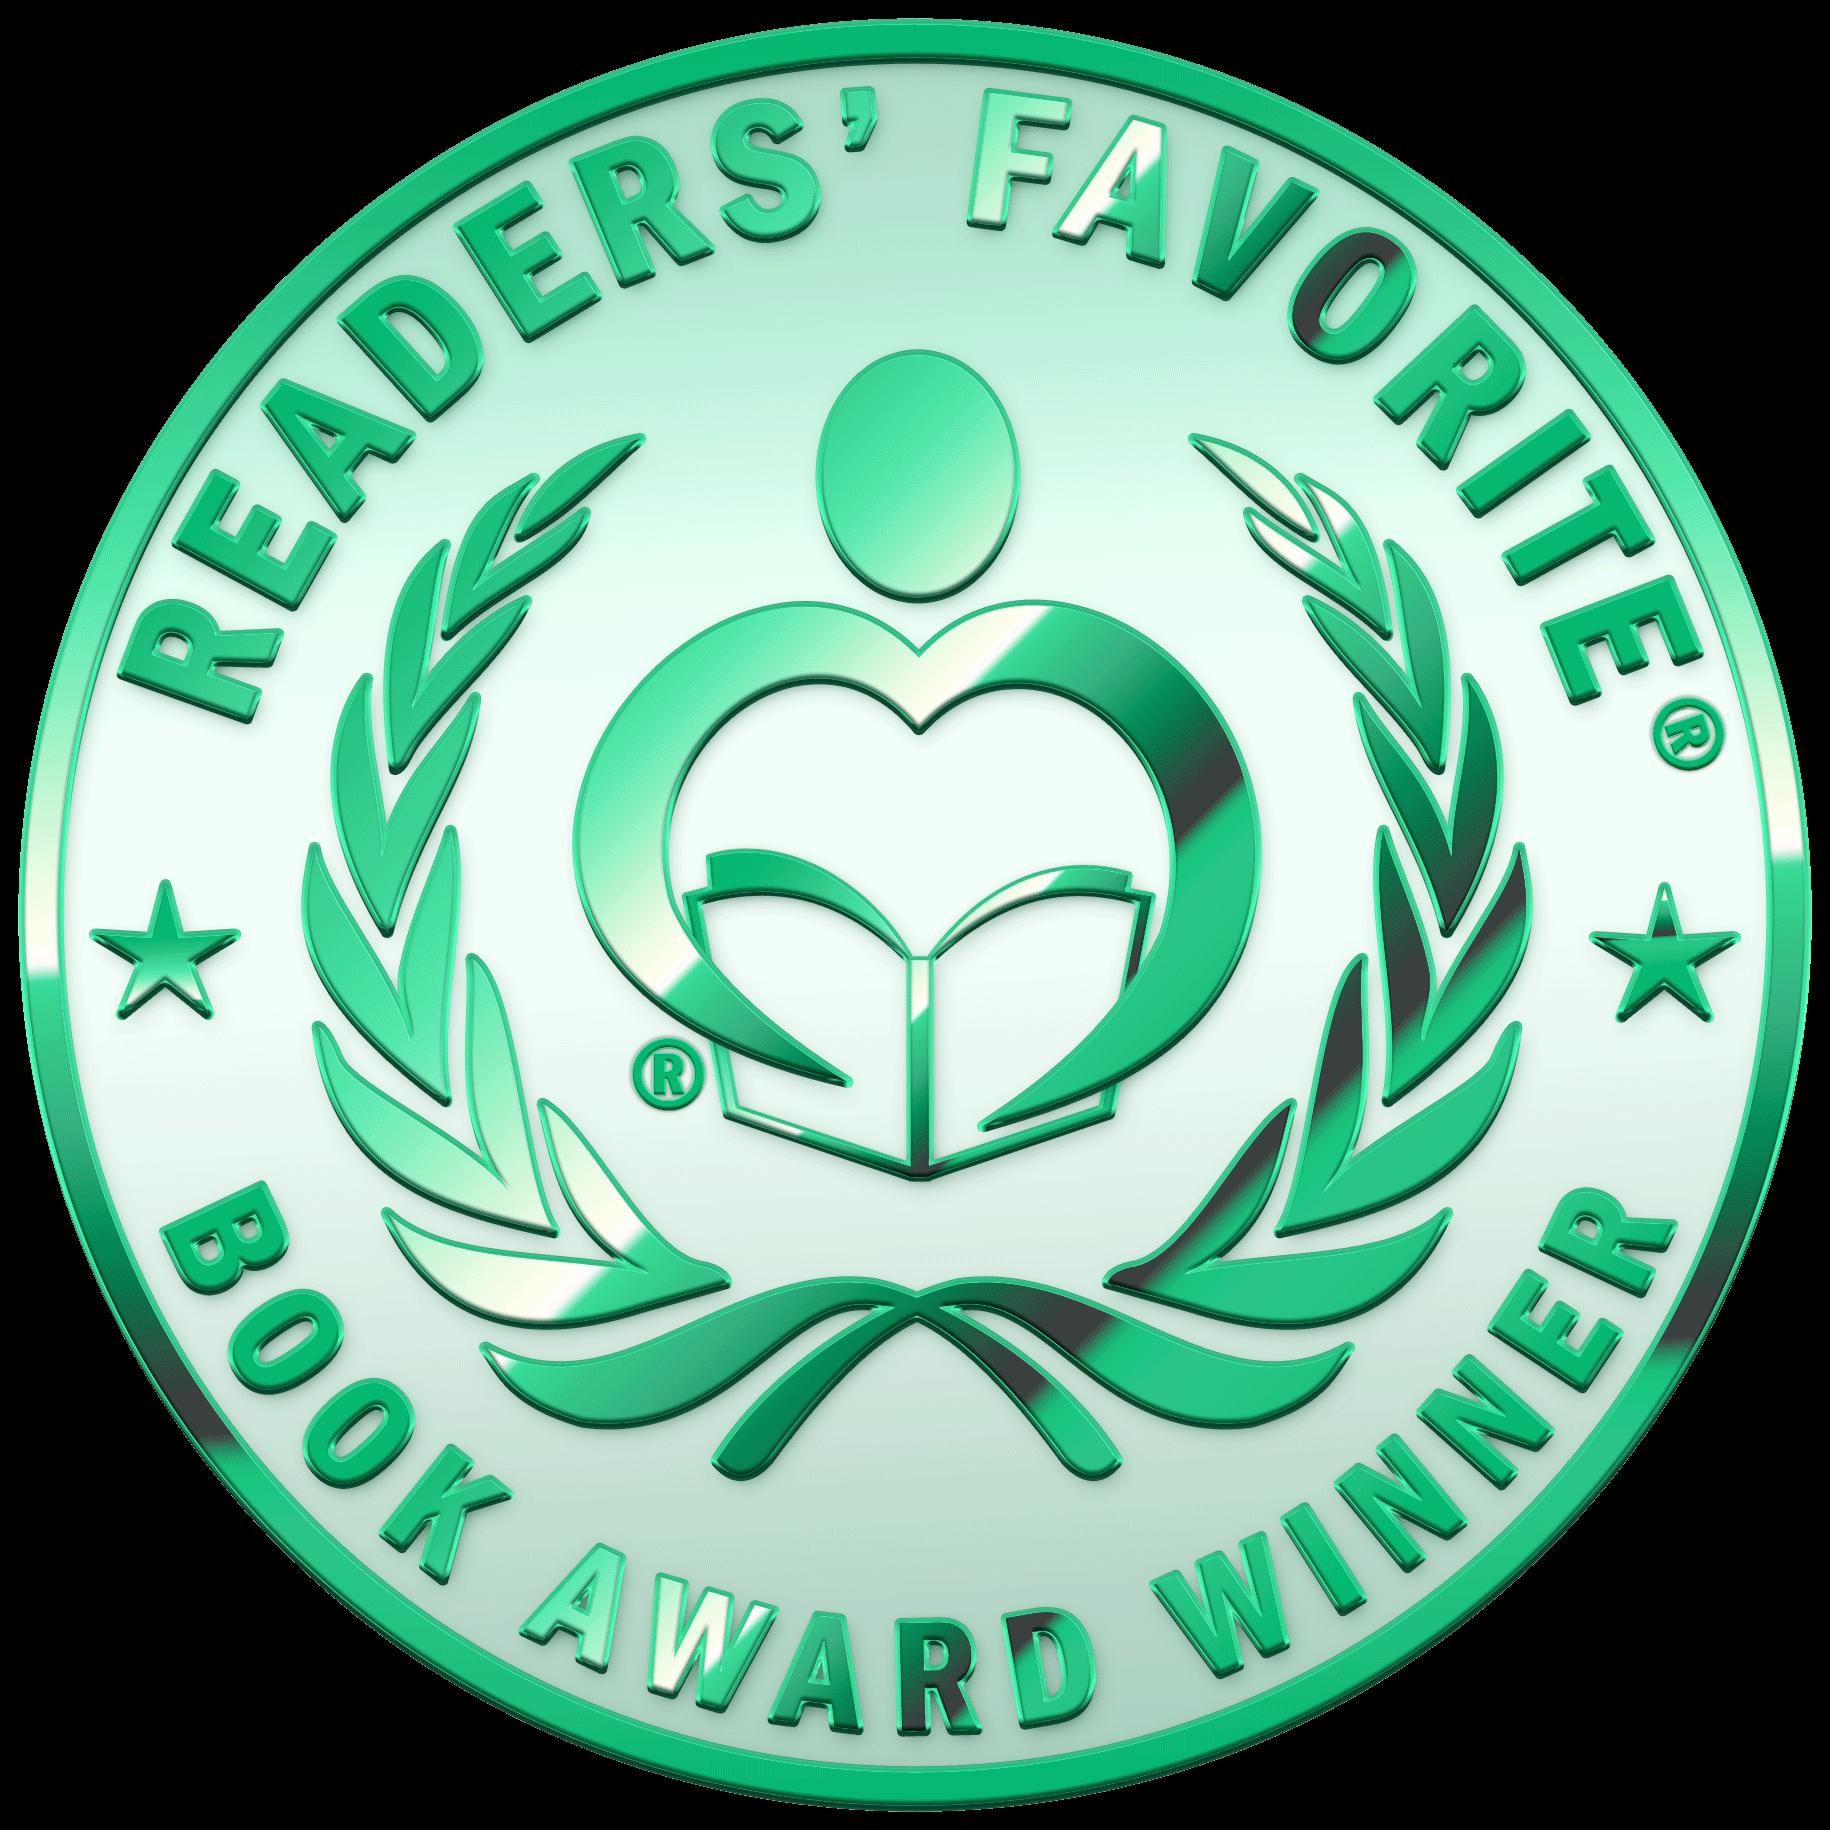 readers-favorite-award-winner.png